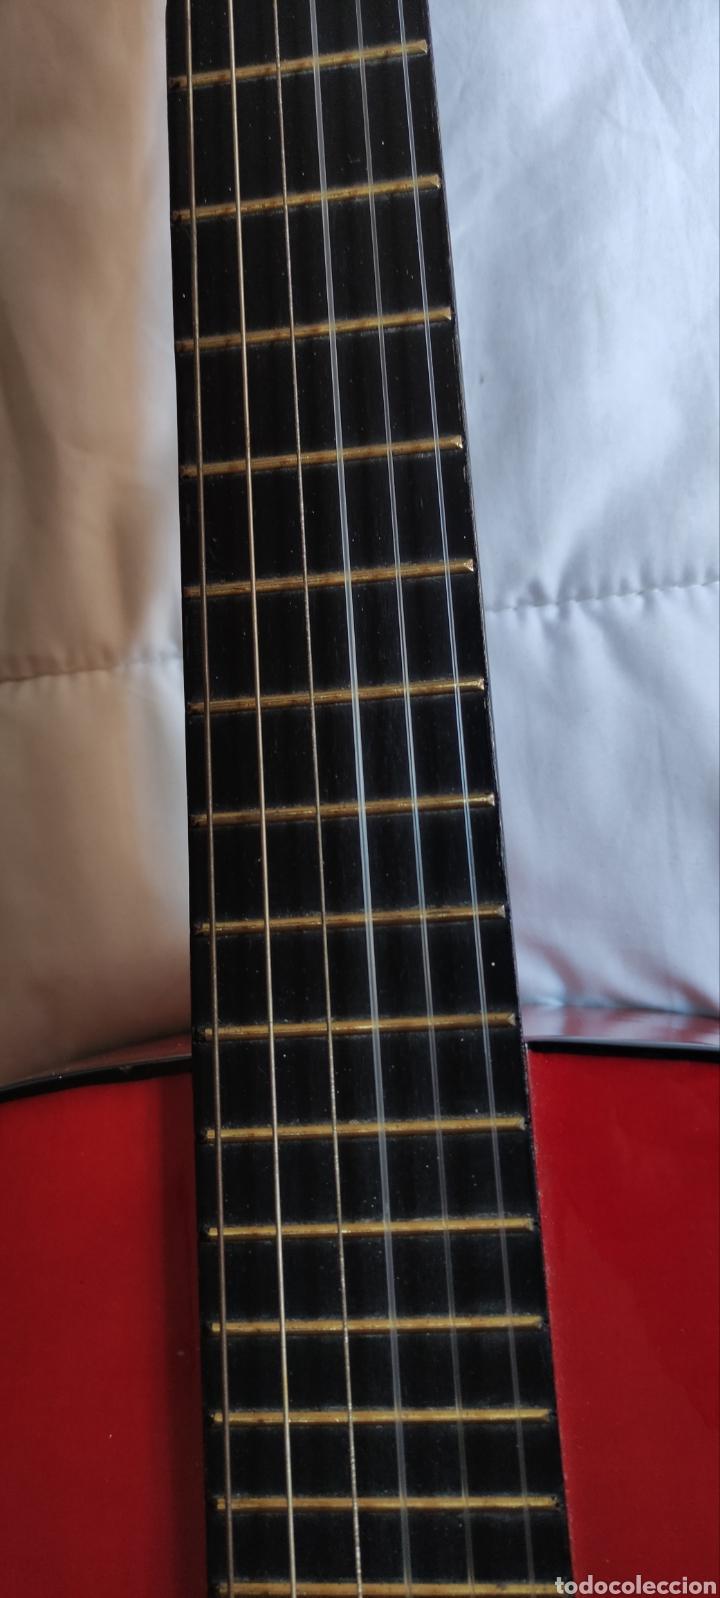 Instrumentos musicales: Guitarra - Foto 17 - 228417015